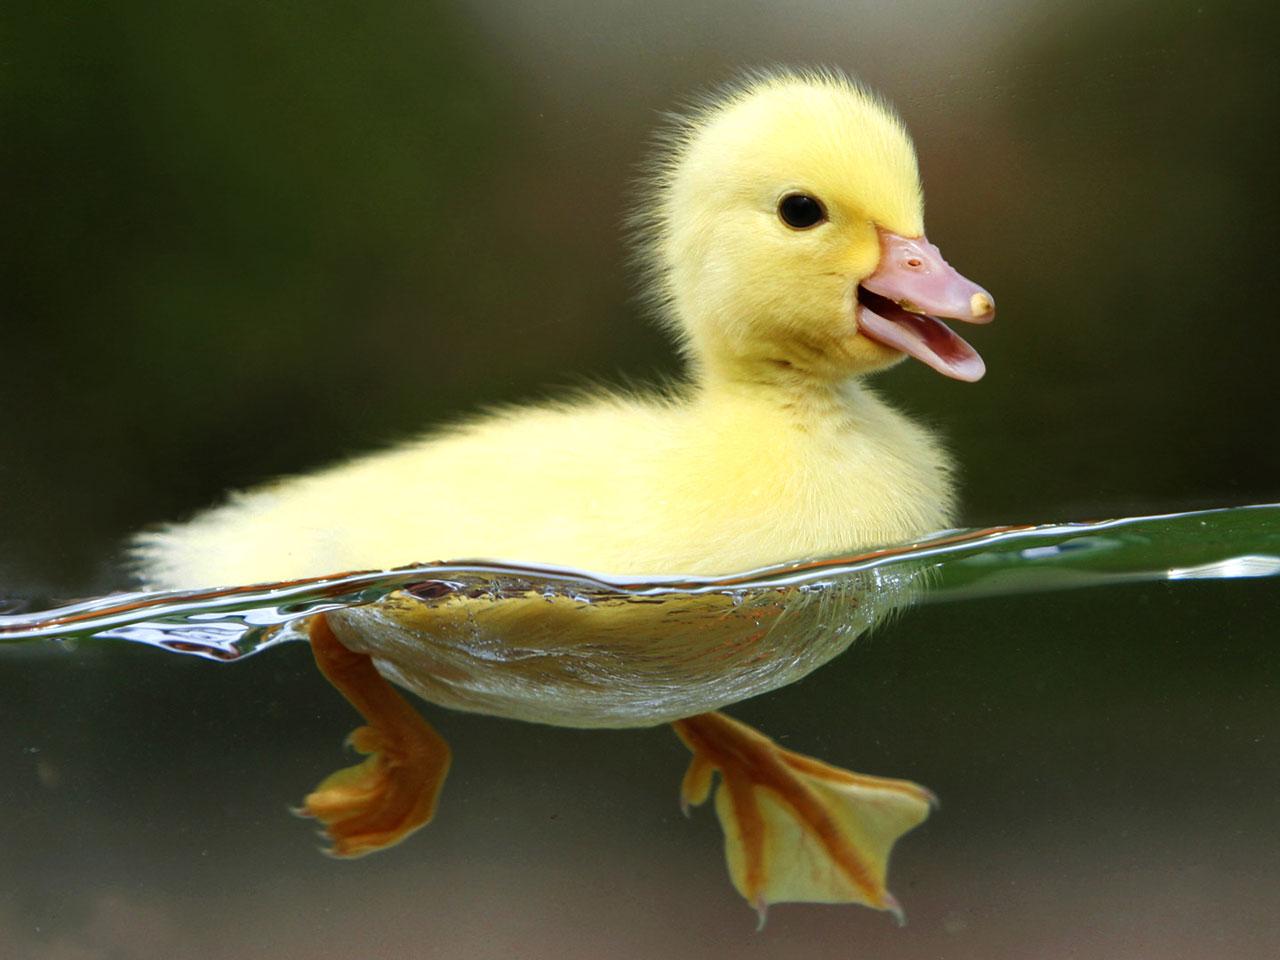 http://2.bp.blogspot.com/-GIUFbPRCIaM/UUCXfR0VbqI/AAAAAAAAIUI/P69-NQlBCSo/s1600/Yellow+Duck+Wallpaper+02.jpg